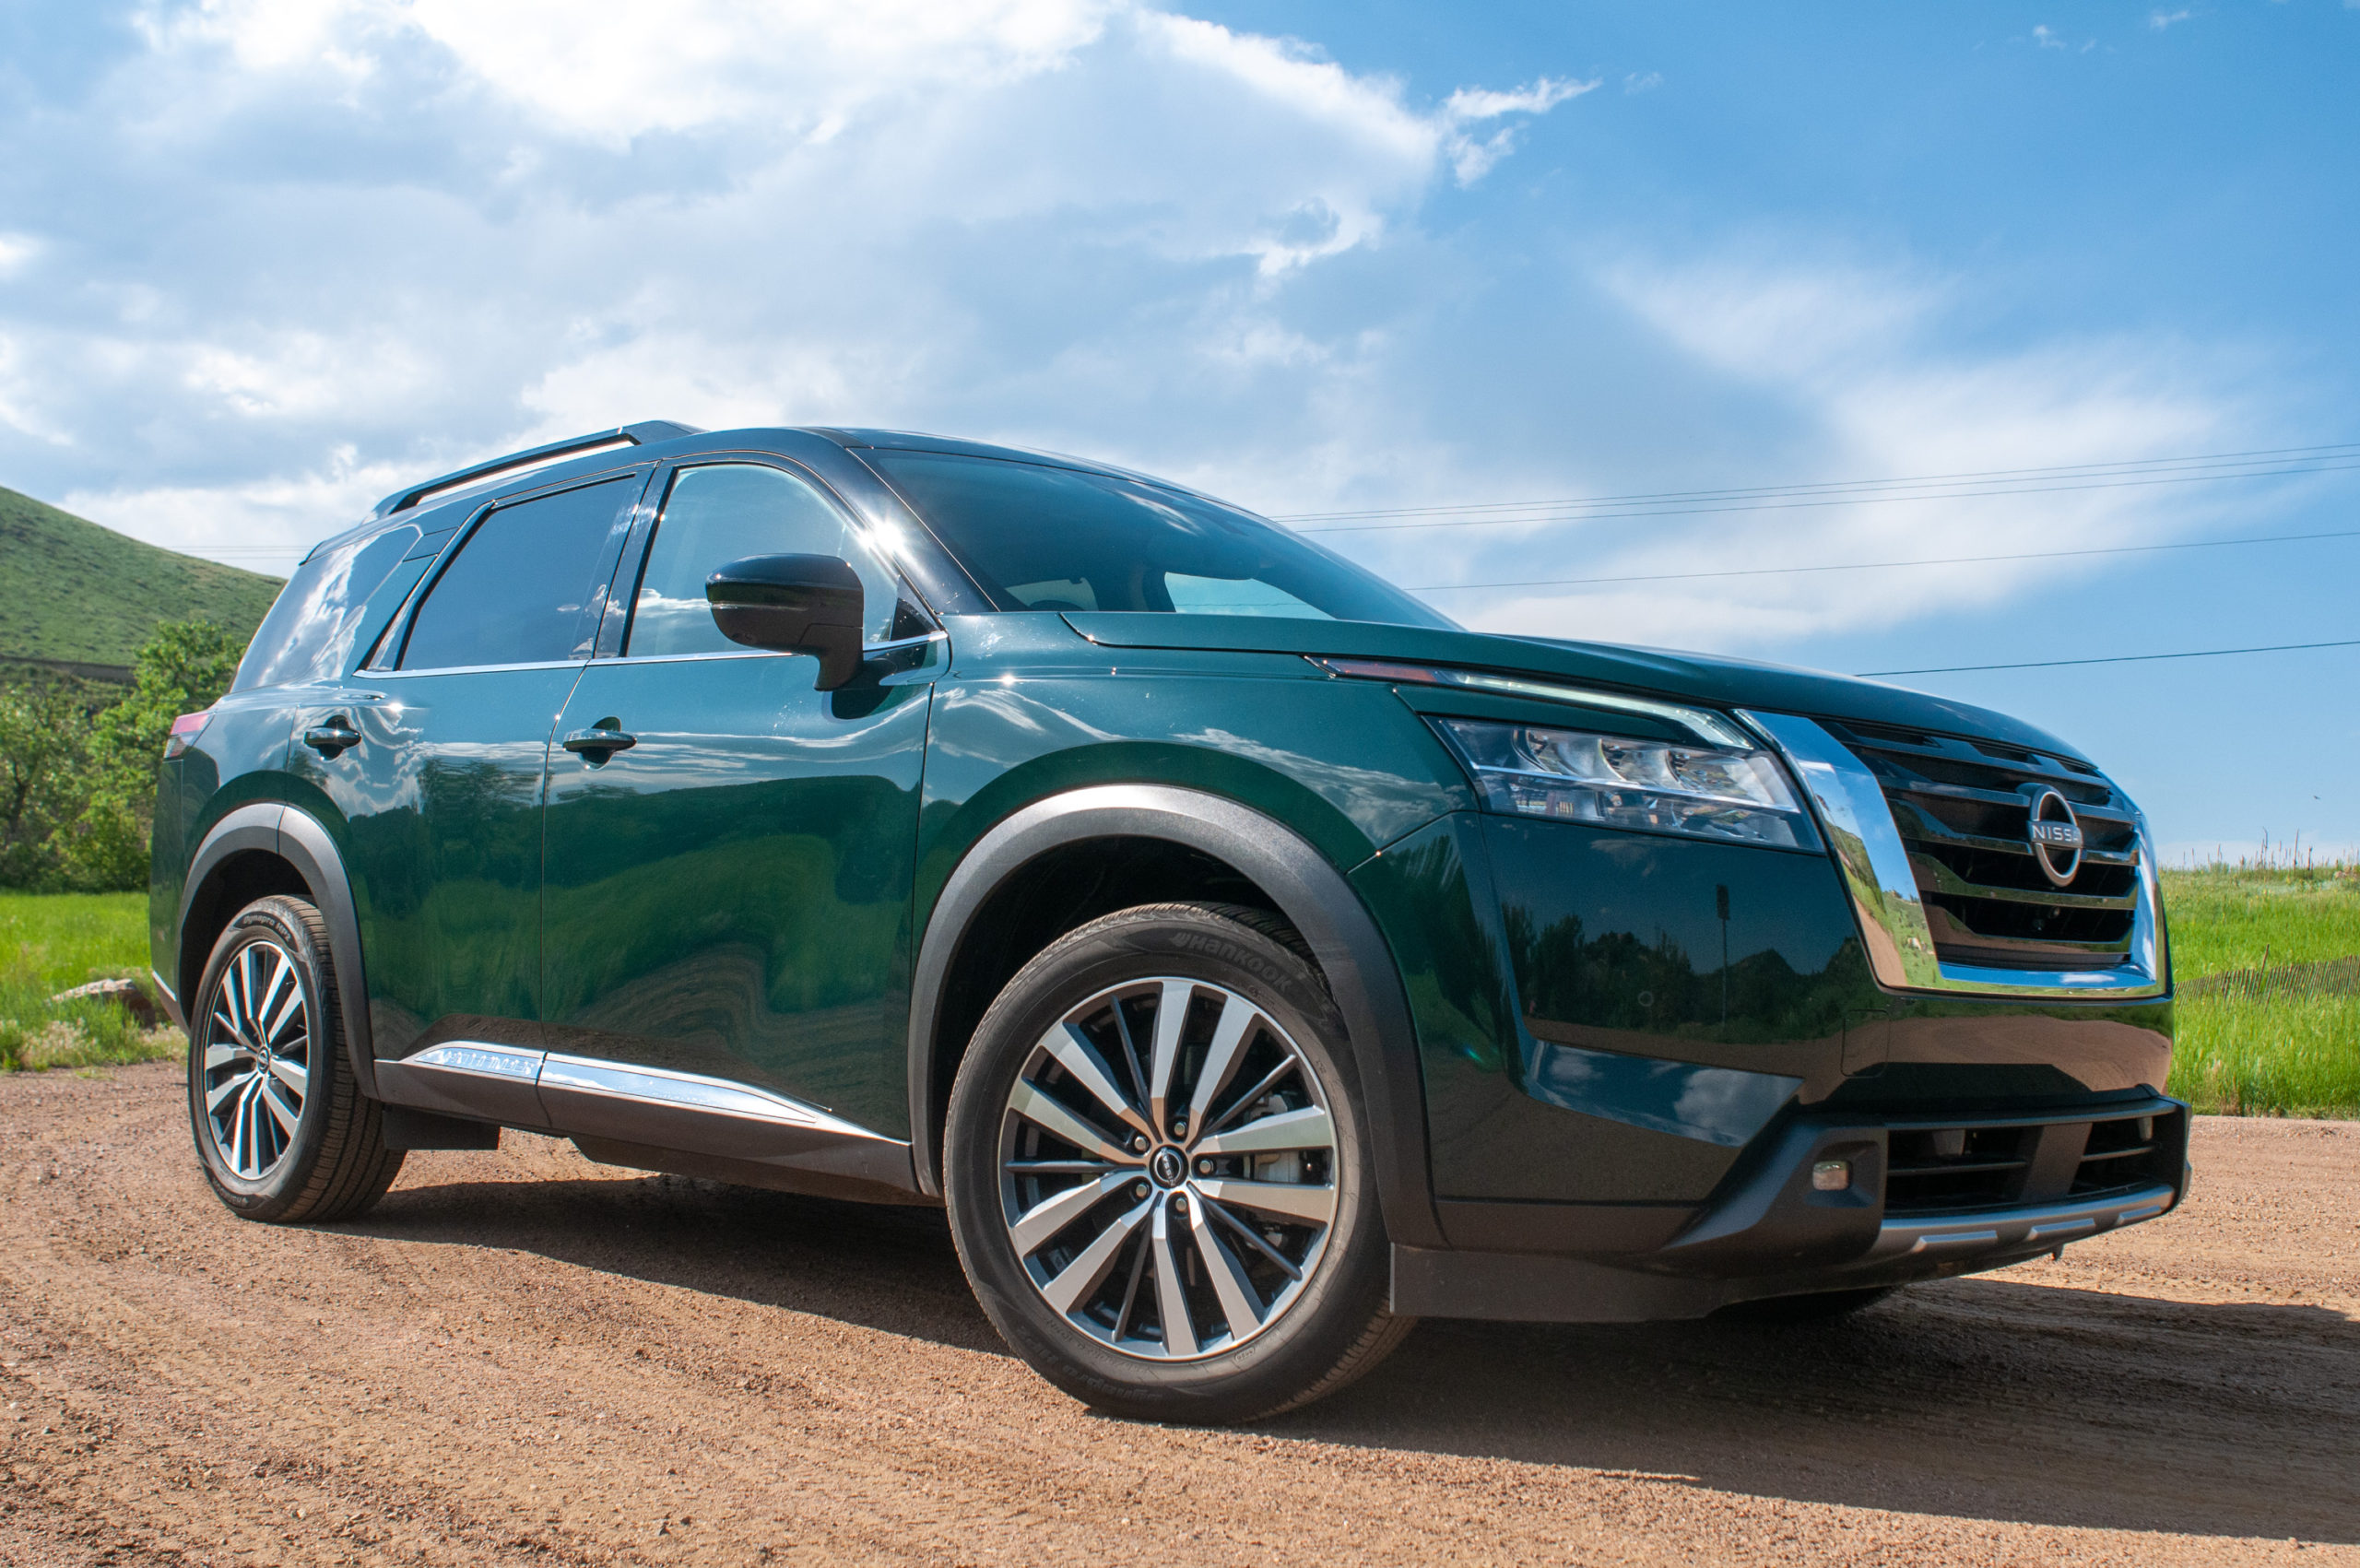 Everyman's Road Trip Machine: 2022 Nissan Pathfinder Makes Driving A Breeze